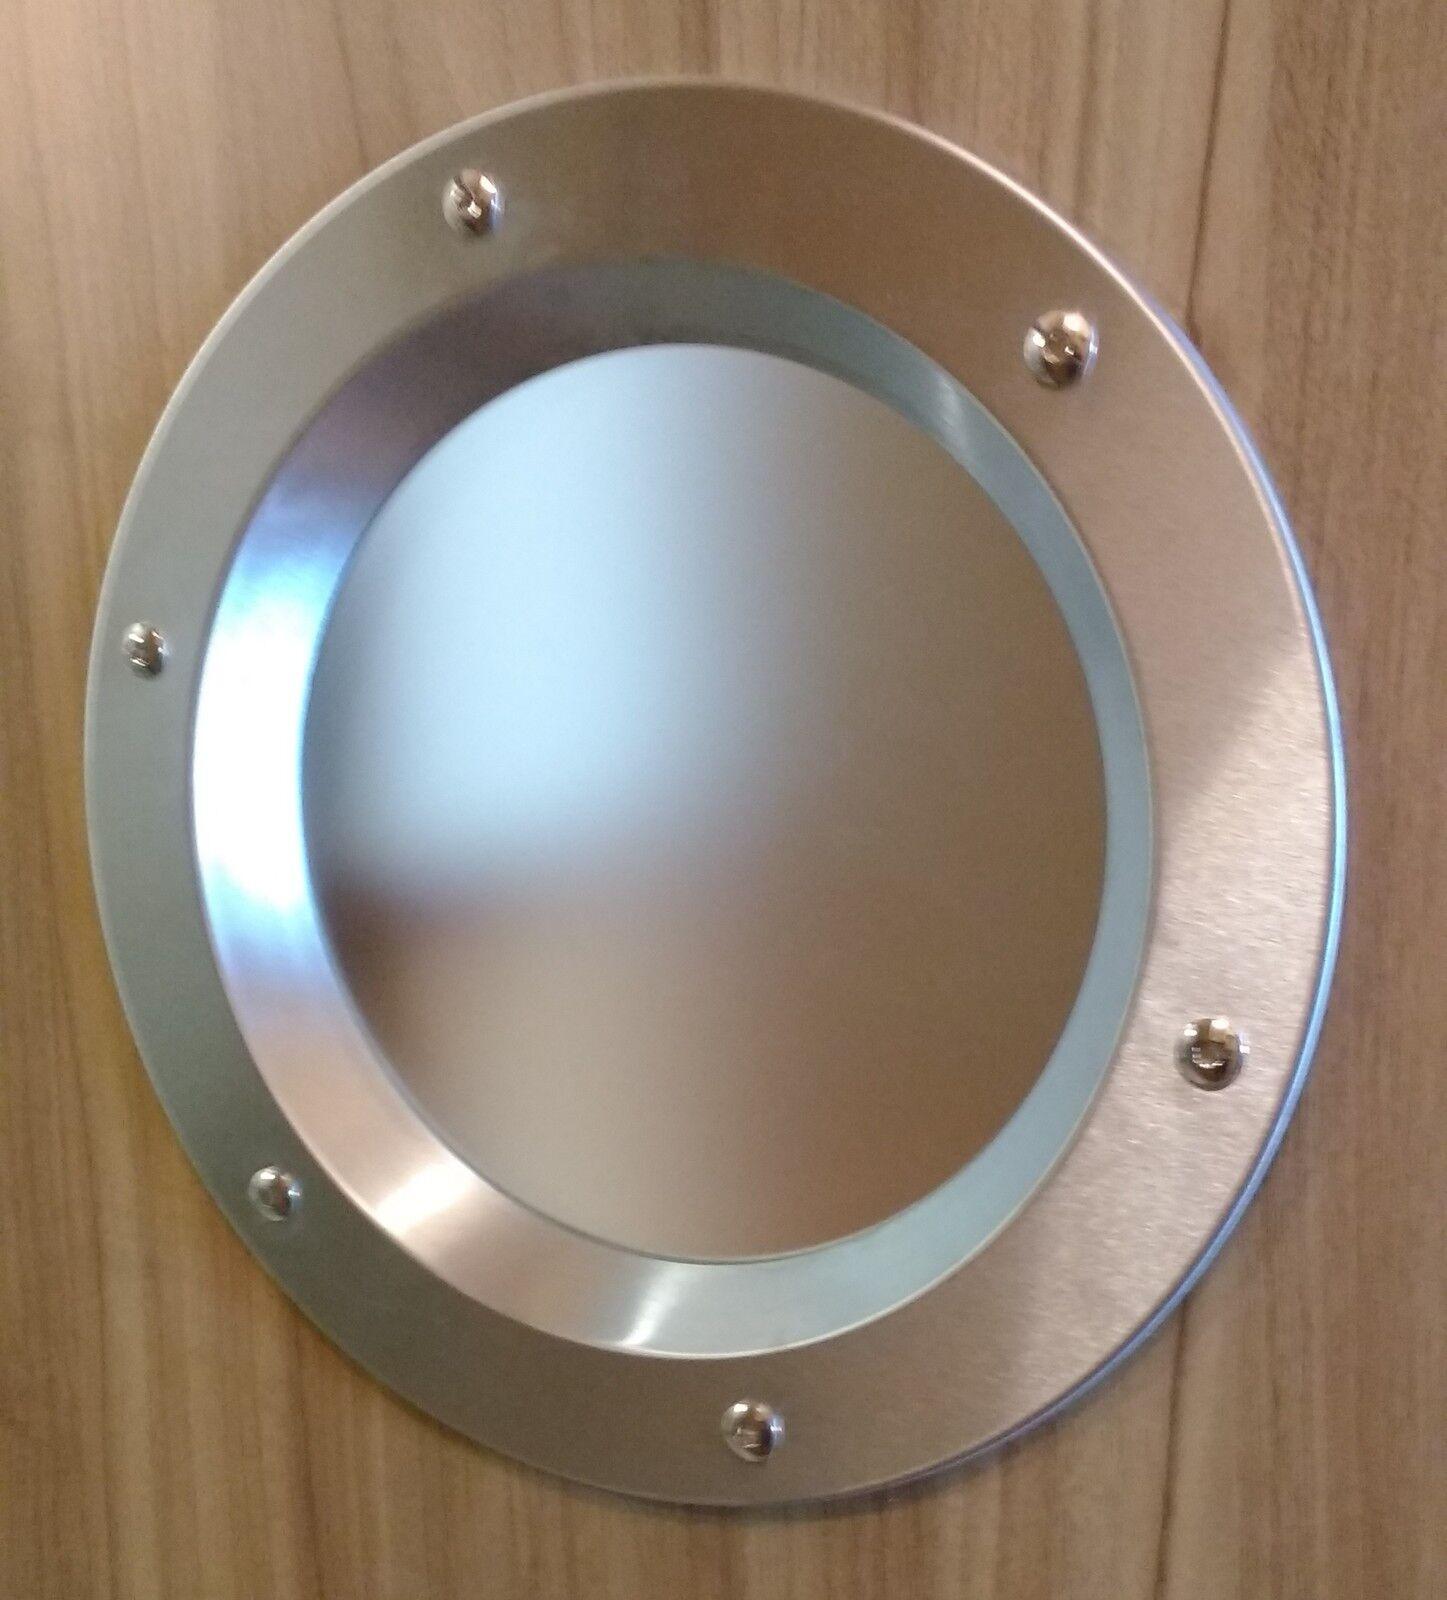 PORTHOLE FOR DOORS phi 350 mm. BEAUTIFUL. nouveau.